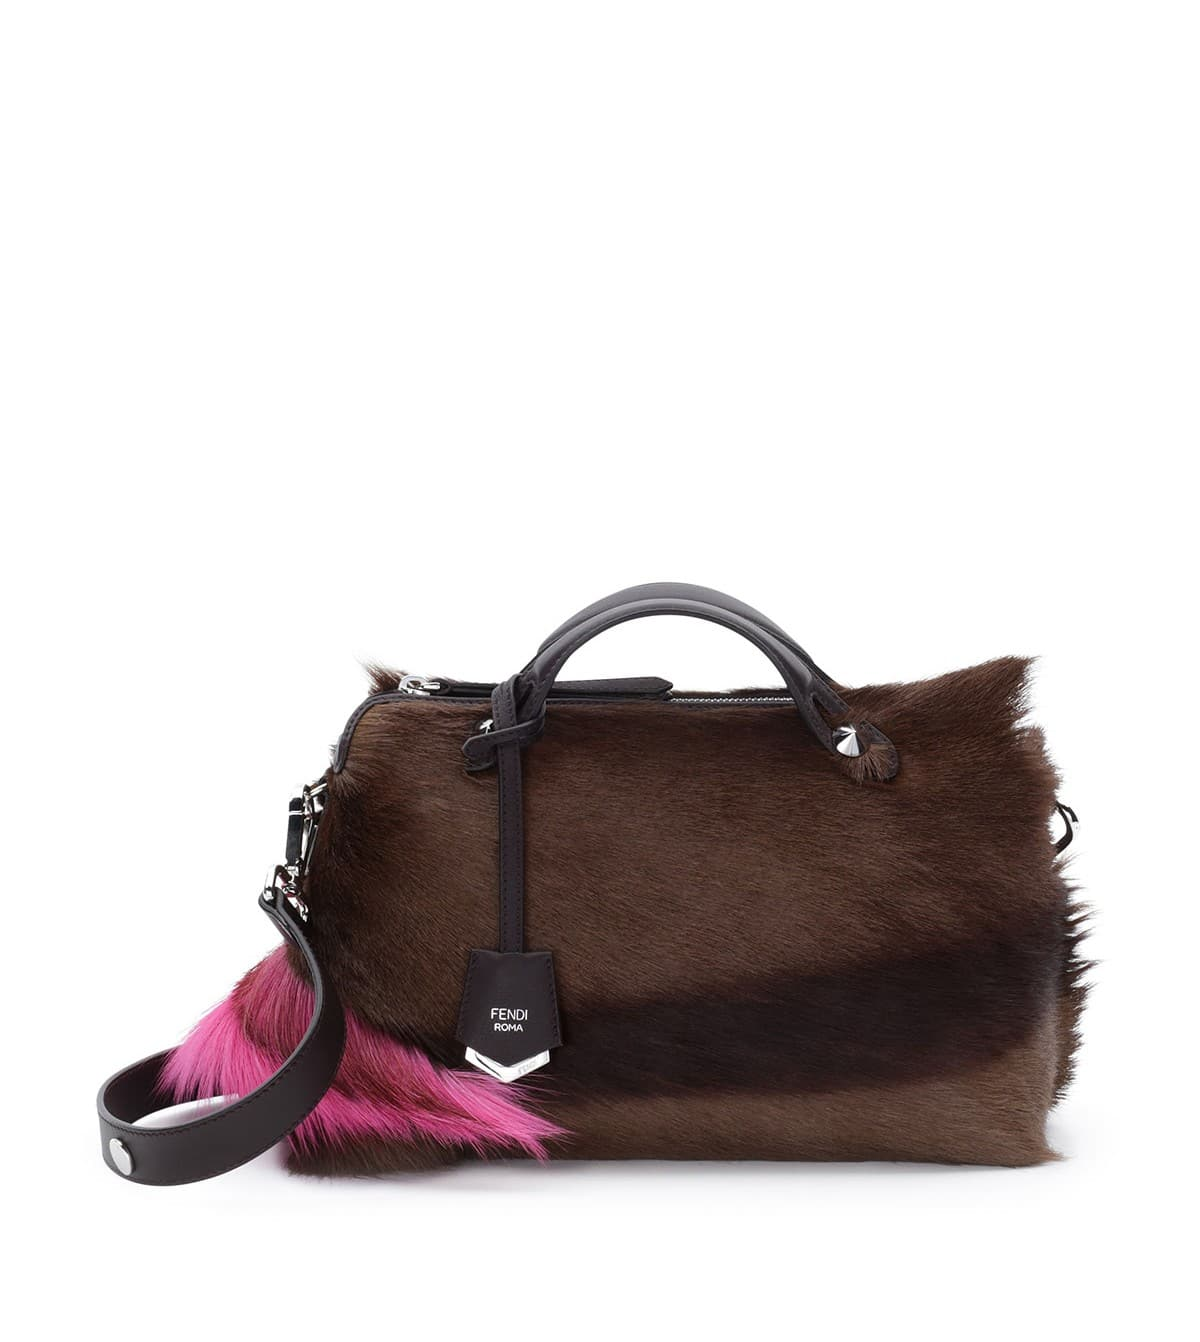 c4fefd565f7e Fendi Brown Pink Fur By The Way Medium Bag